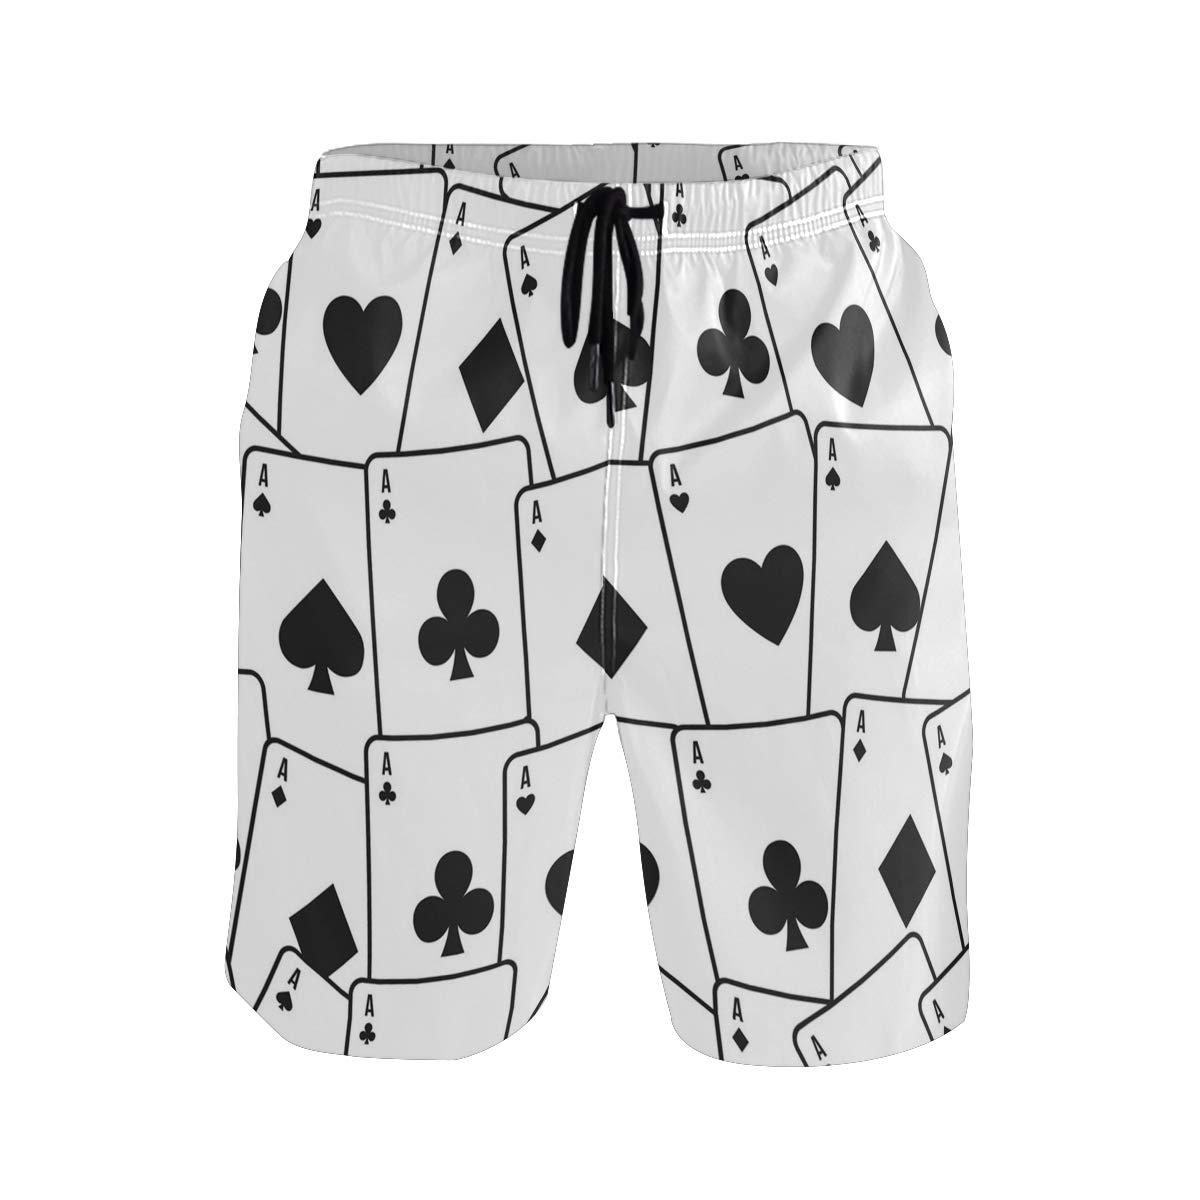 NBTZ ZX Playing Poker Mens Quick Dry Swim Trunks Summer Beach Board Shorts with mesh Lining